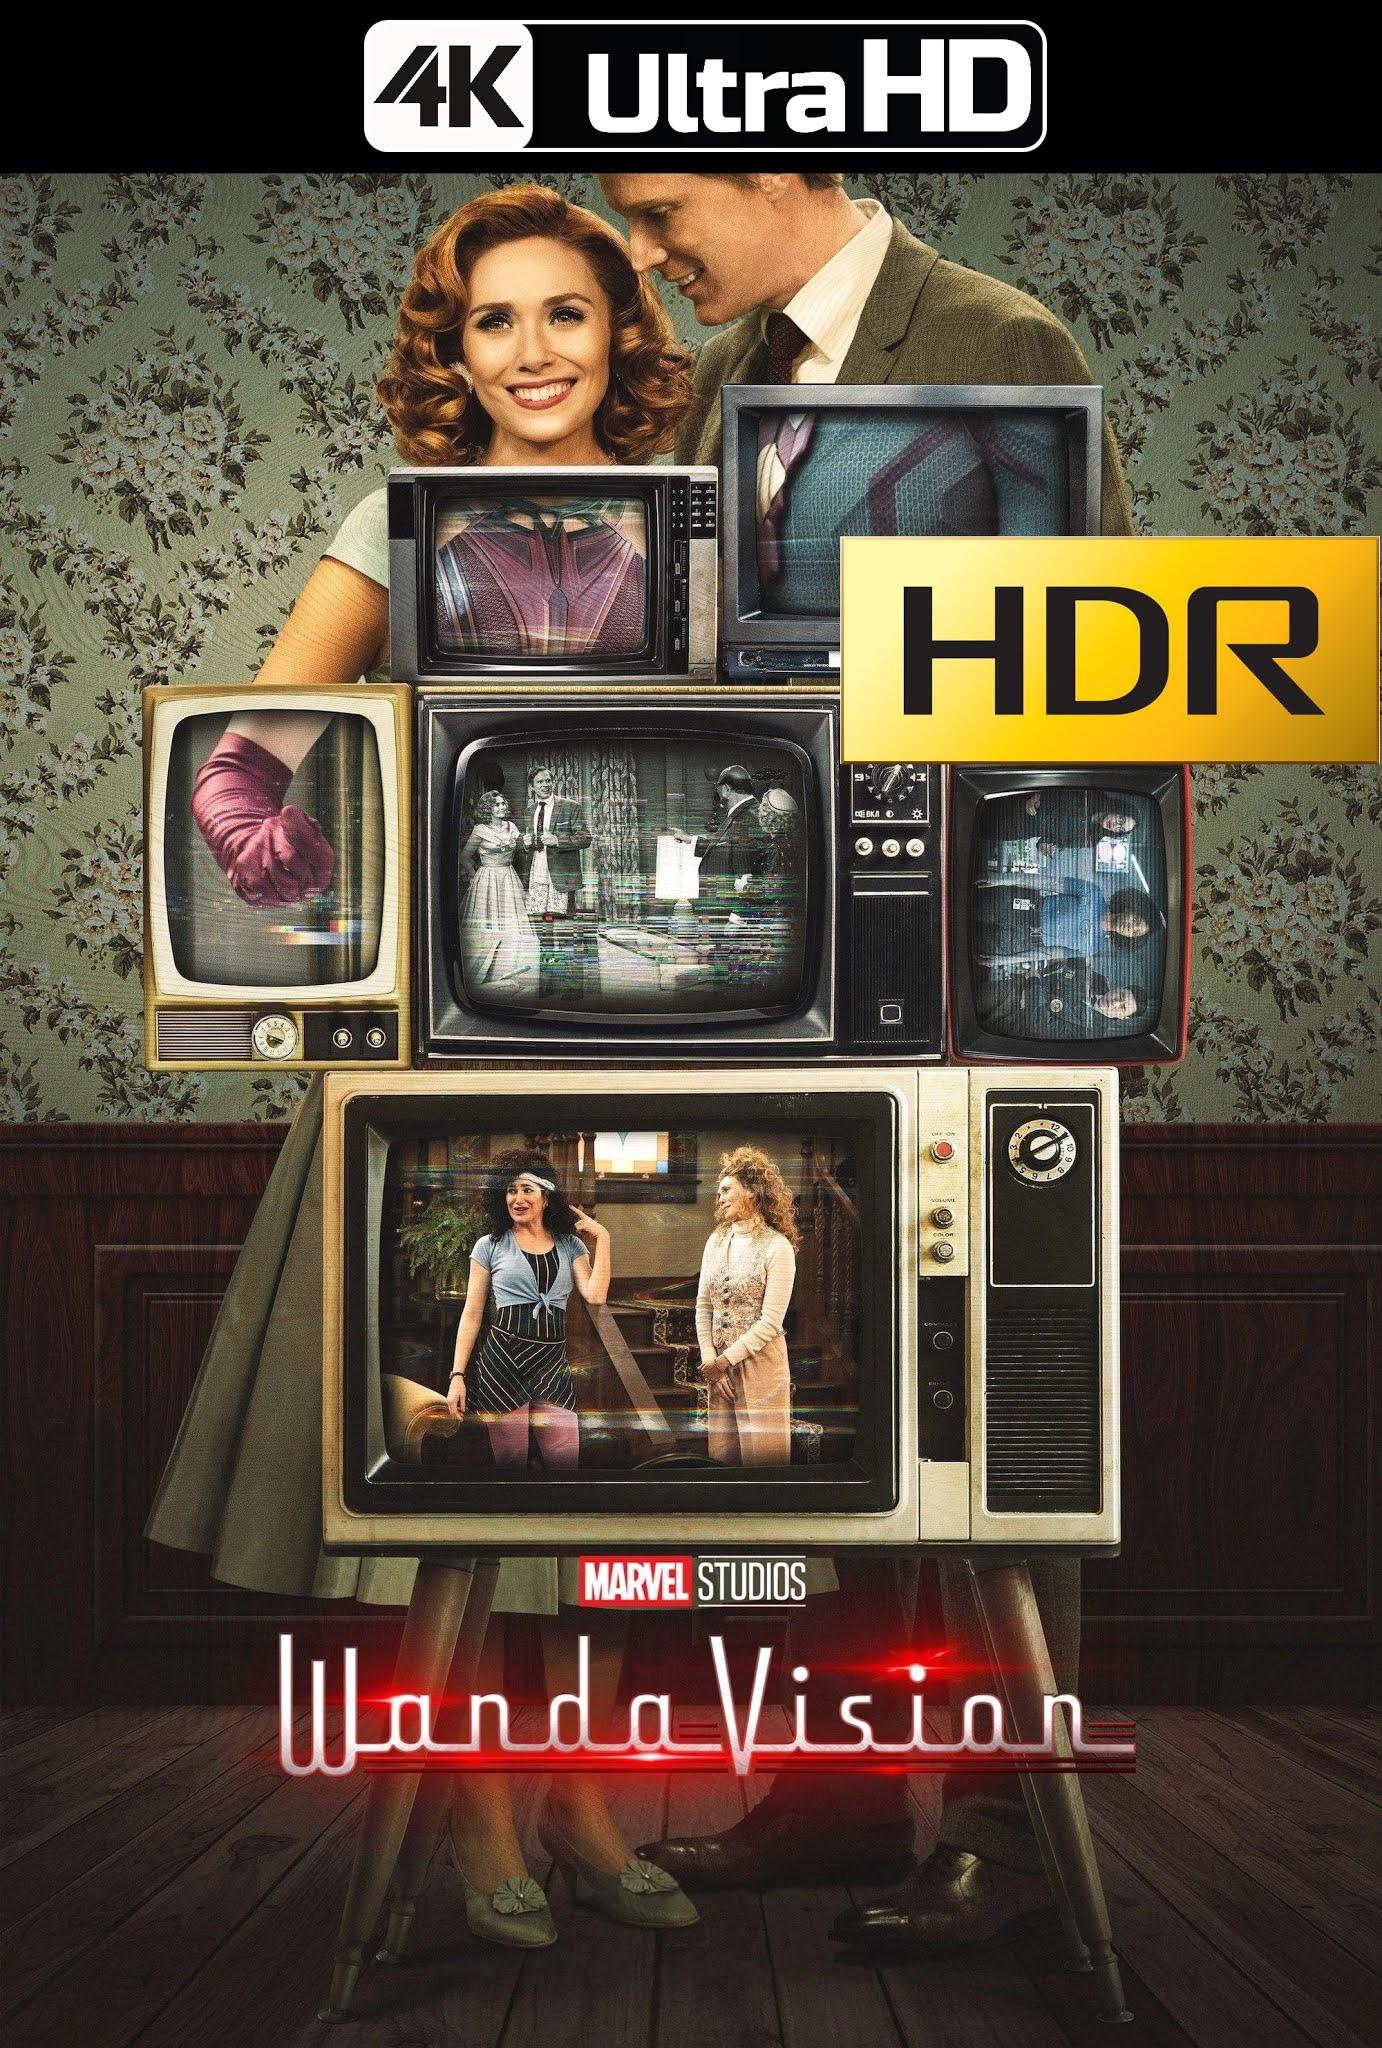 WandaVision (2021) temporada 1 Web-DL 4K UHD HDR Latino